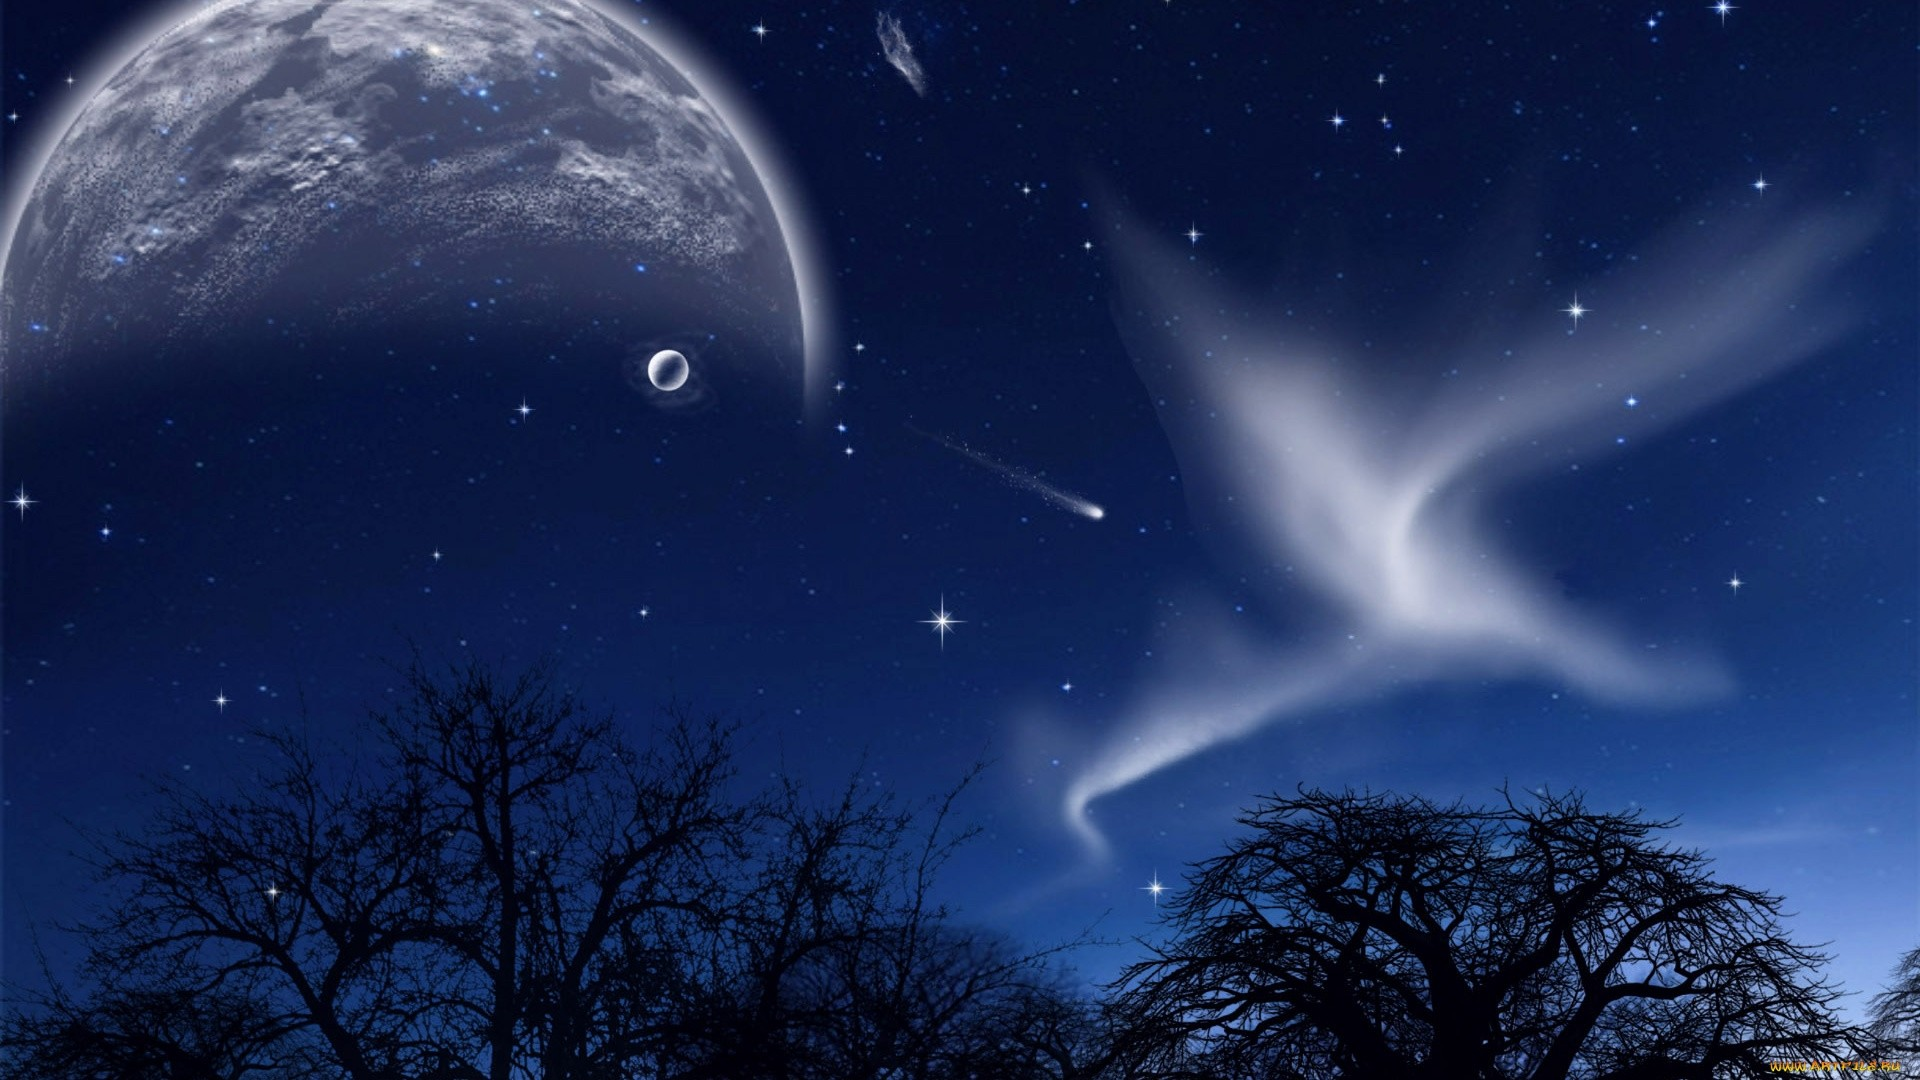 Moon And Stars wallpaper photo hd